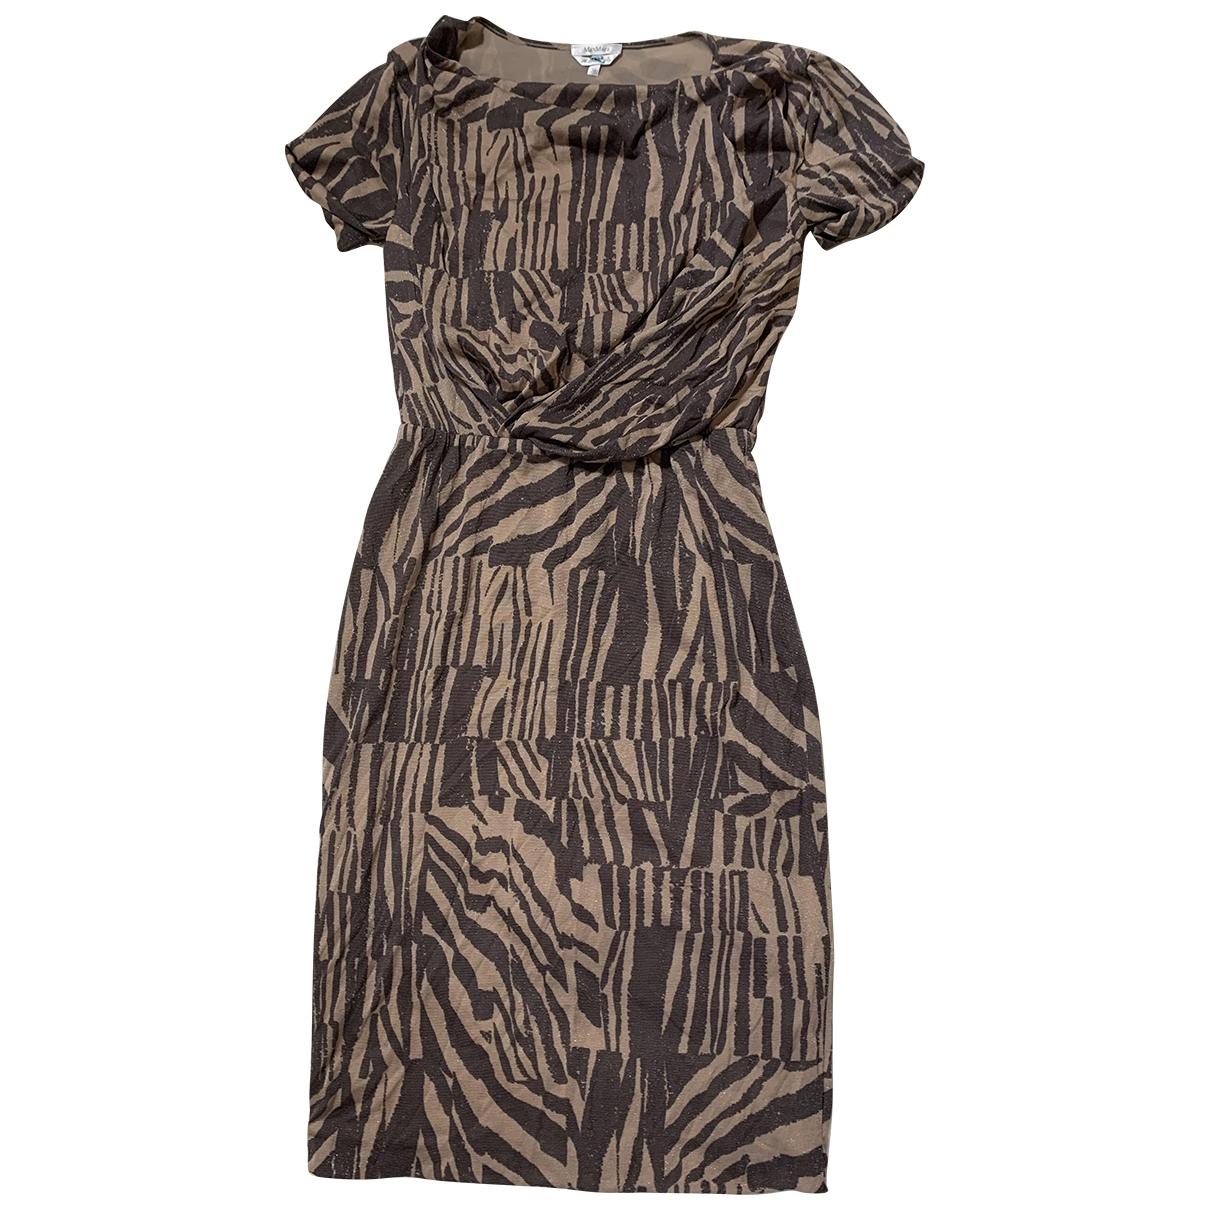 Max Mara \N Beige dress for Women 38 FR